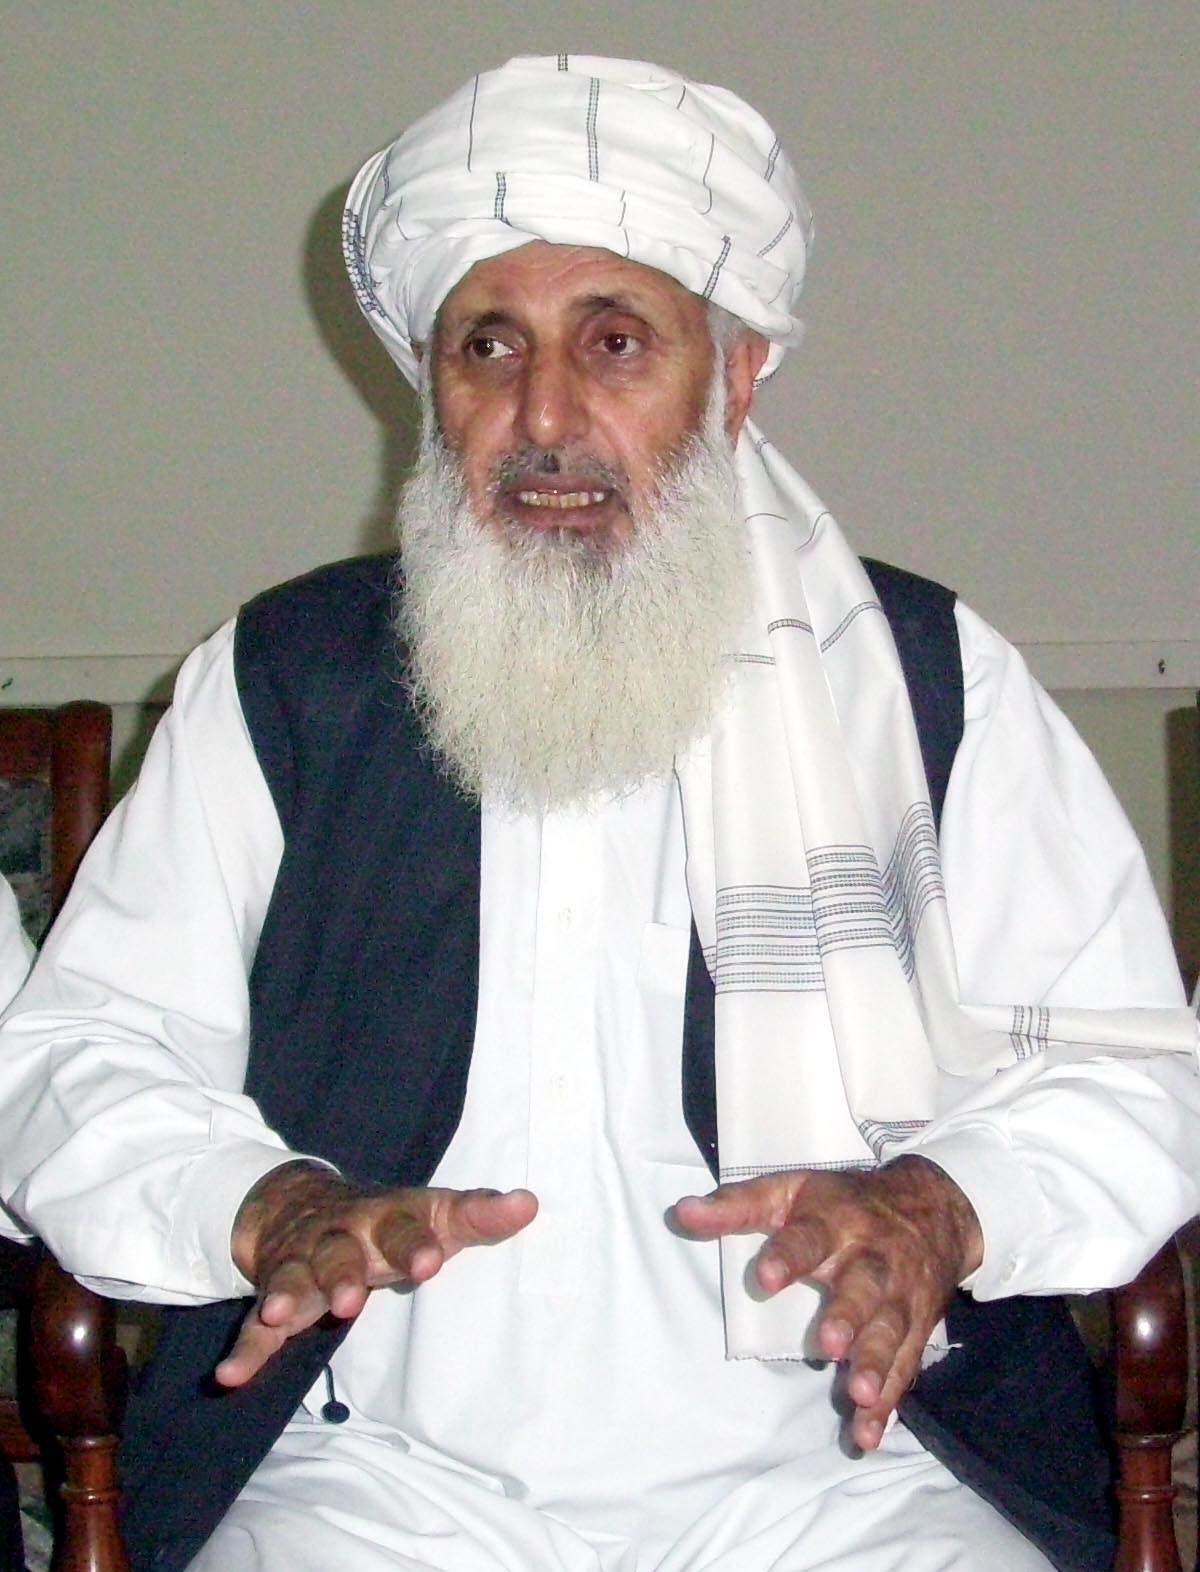 TTP intermediary Professor Ibrahim. PHOTO: SAMEER RAZZAQ